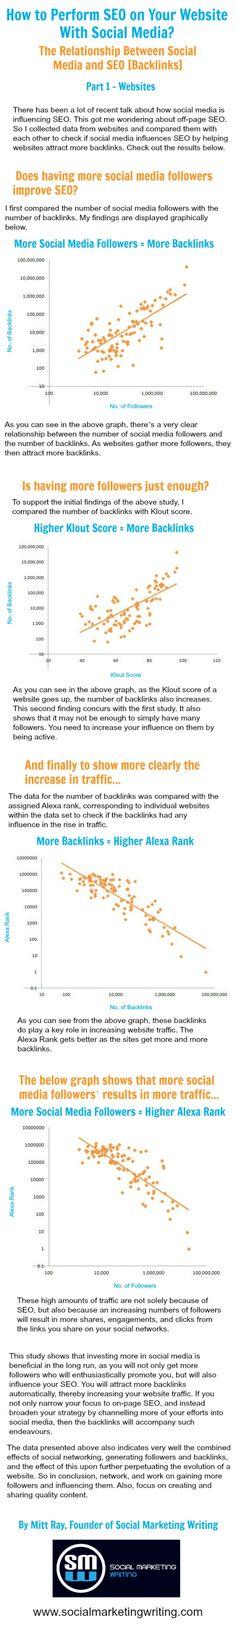 De relatie tussen SEO en social media - #infographic #socialmedia